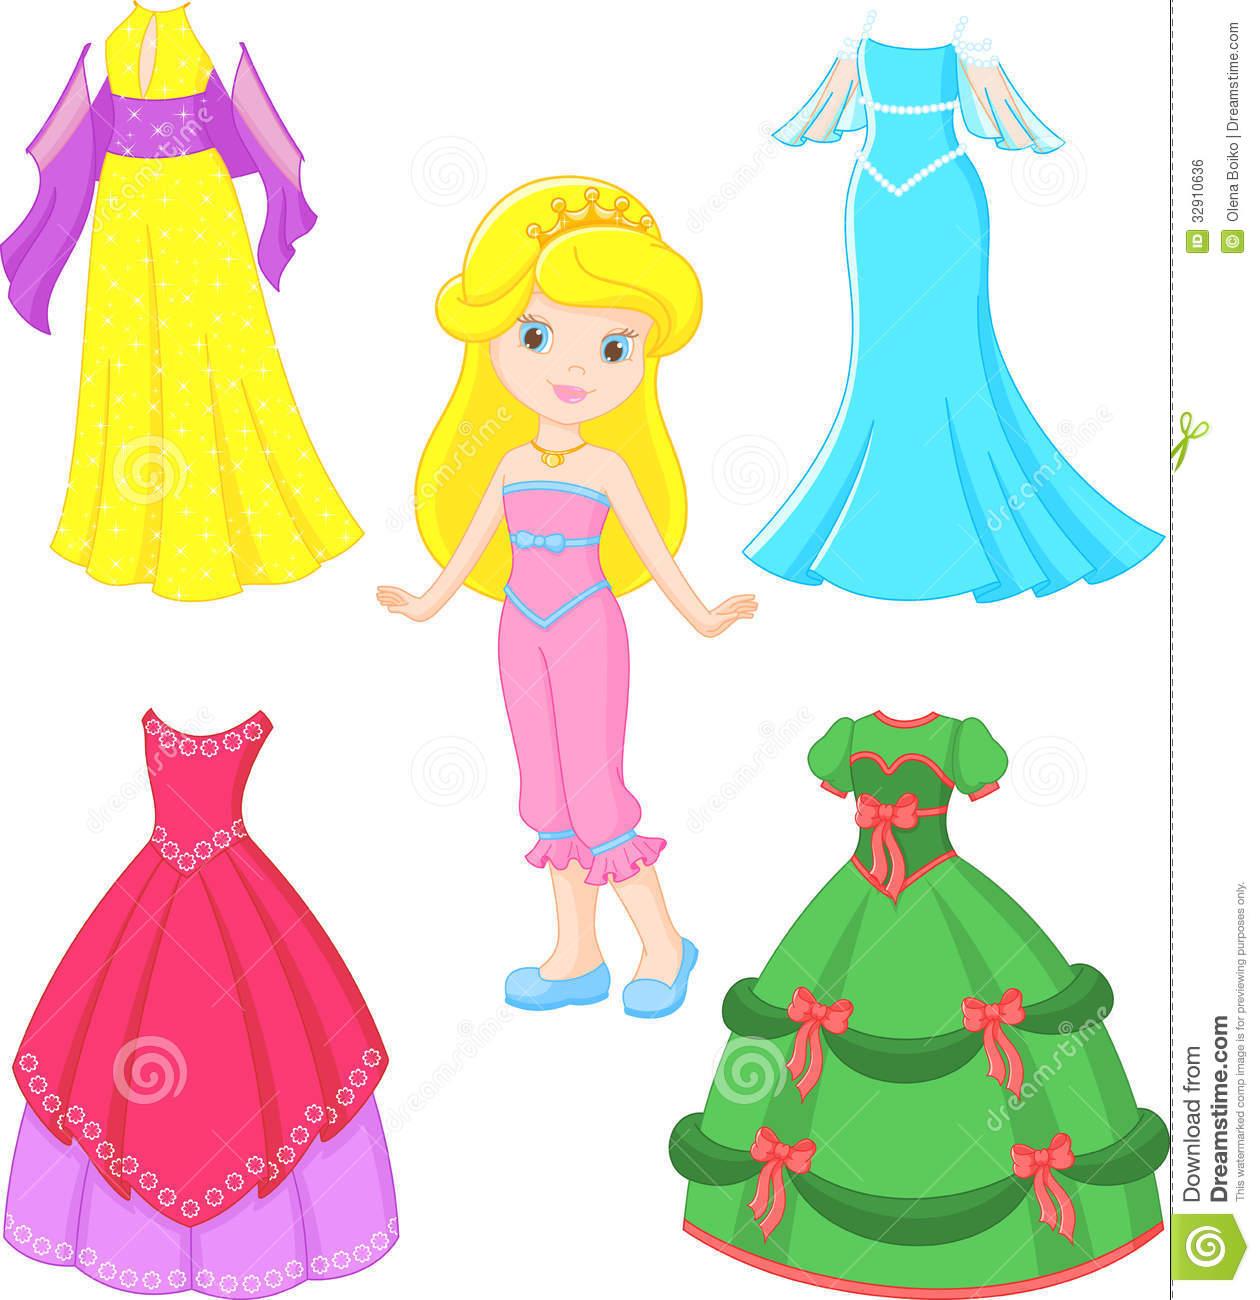 Princess Dress Clipart Princess Dress Clipartprincess Dress Royalty